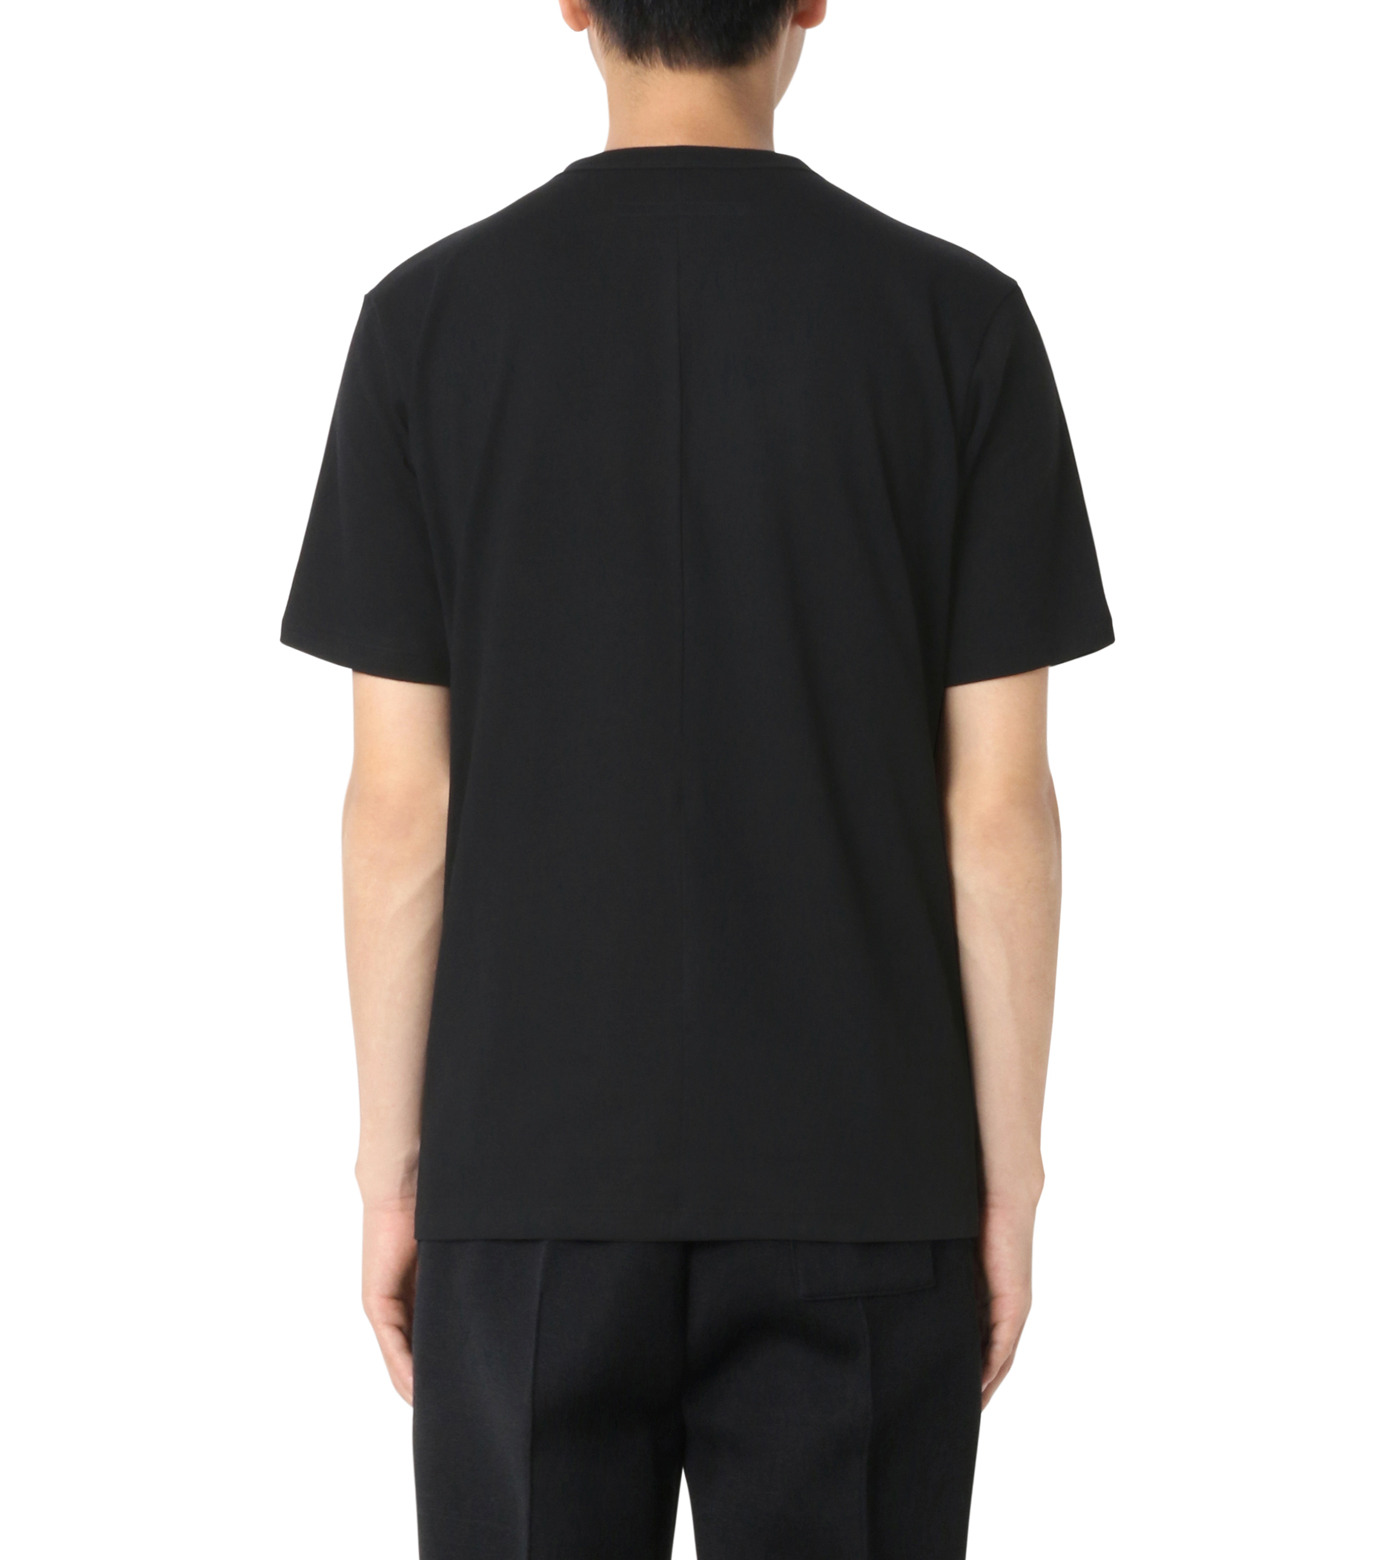 DRESSEDUNDRESSED(ドレスドアンドレスド)のPrinted T-BLACK(カットソー/cut and sewn)-DUW16182-13 拡大詳細画像2